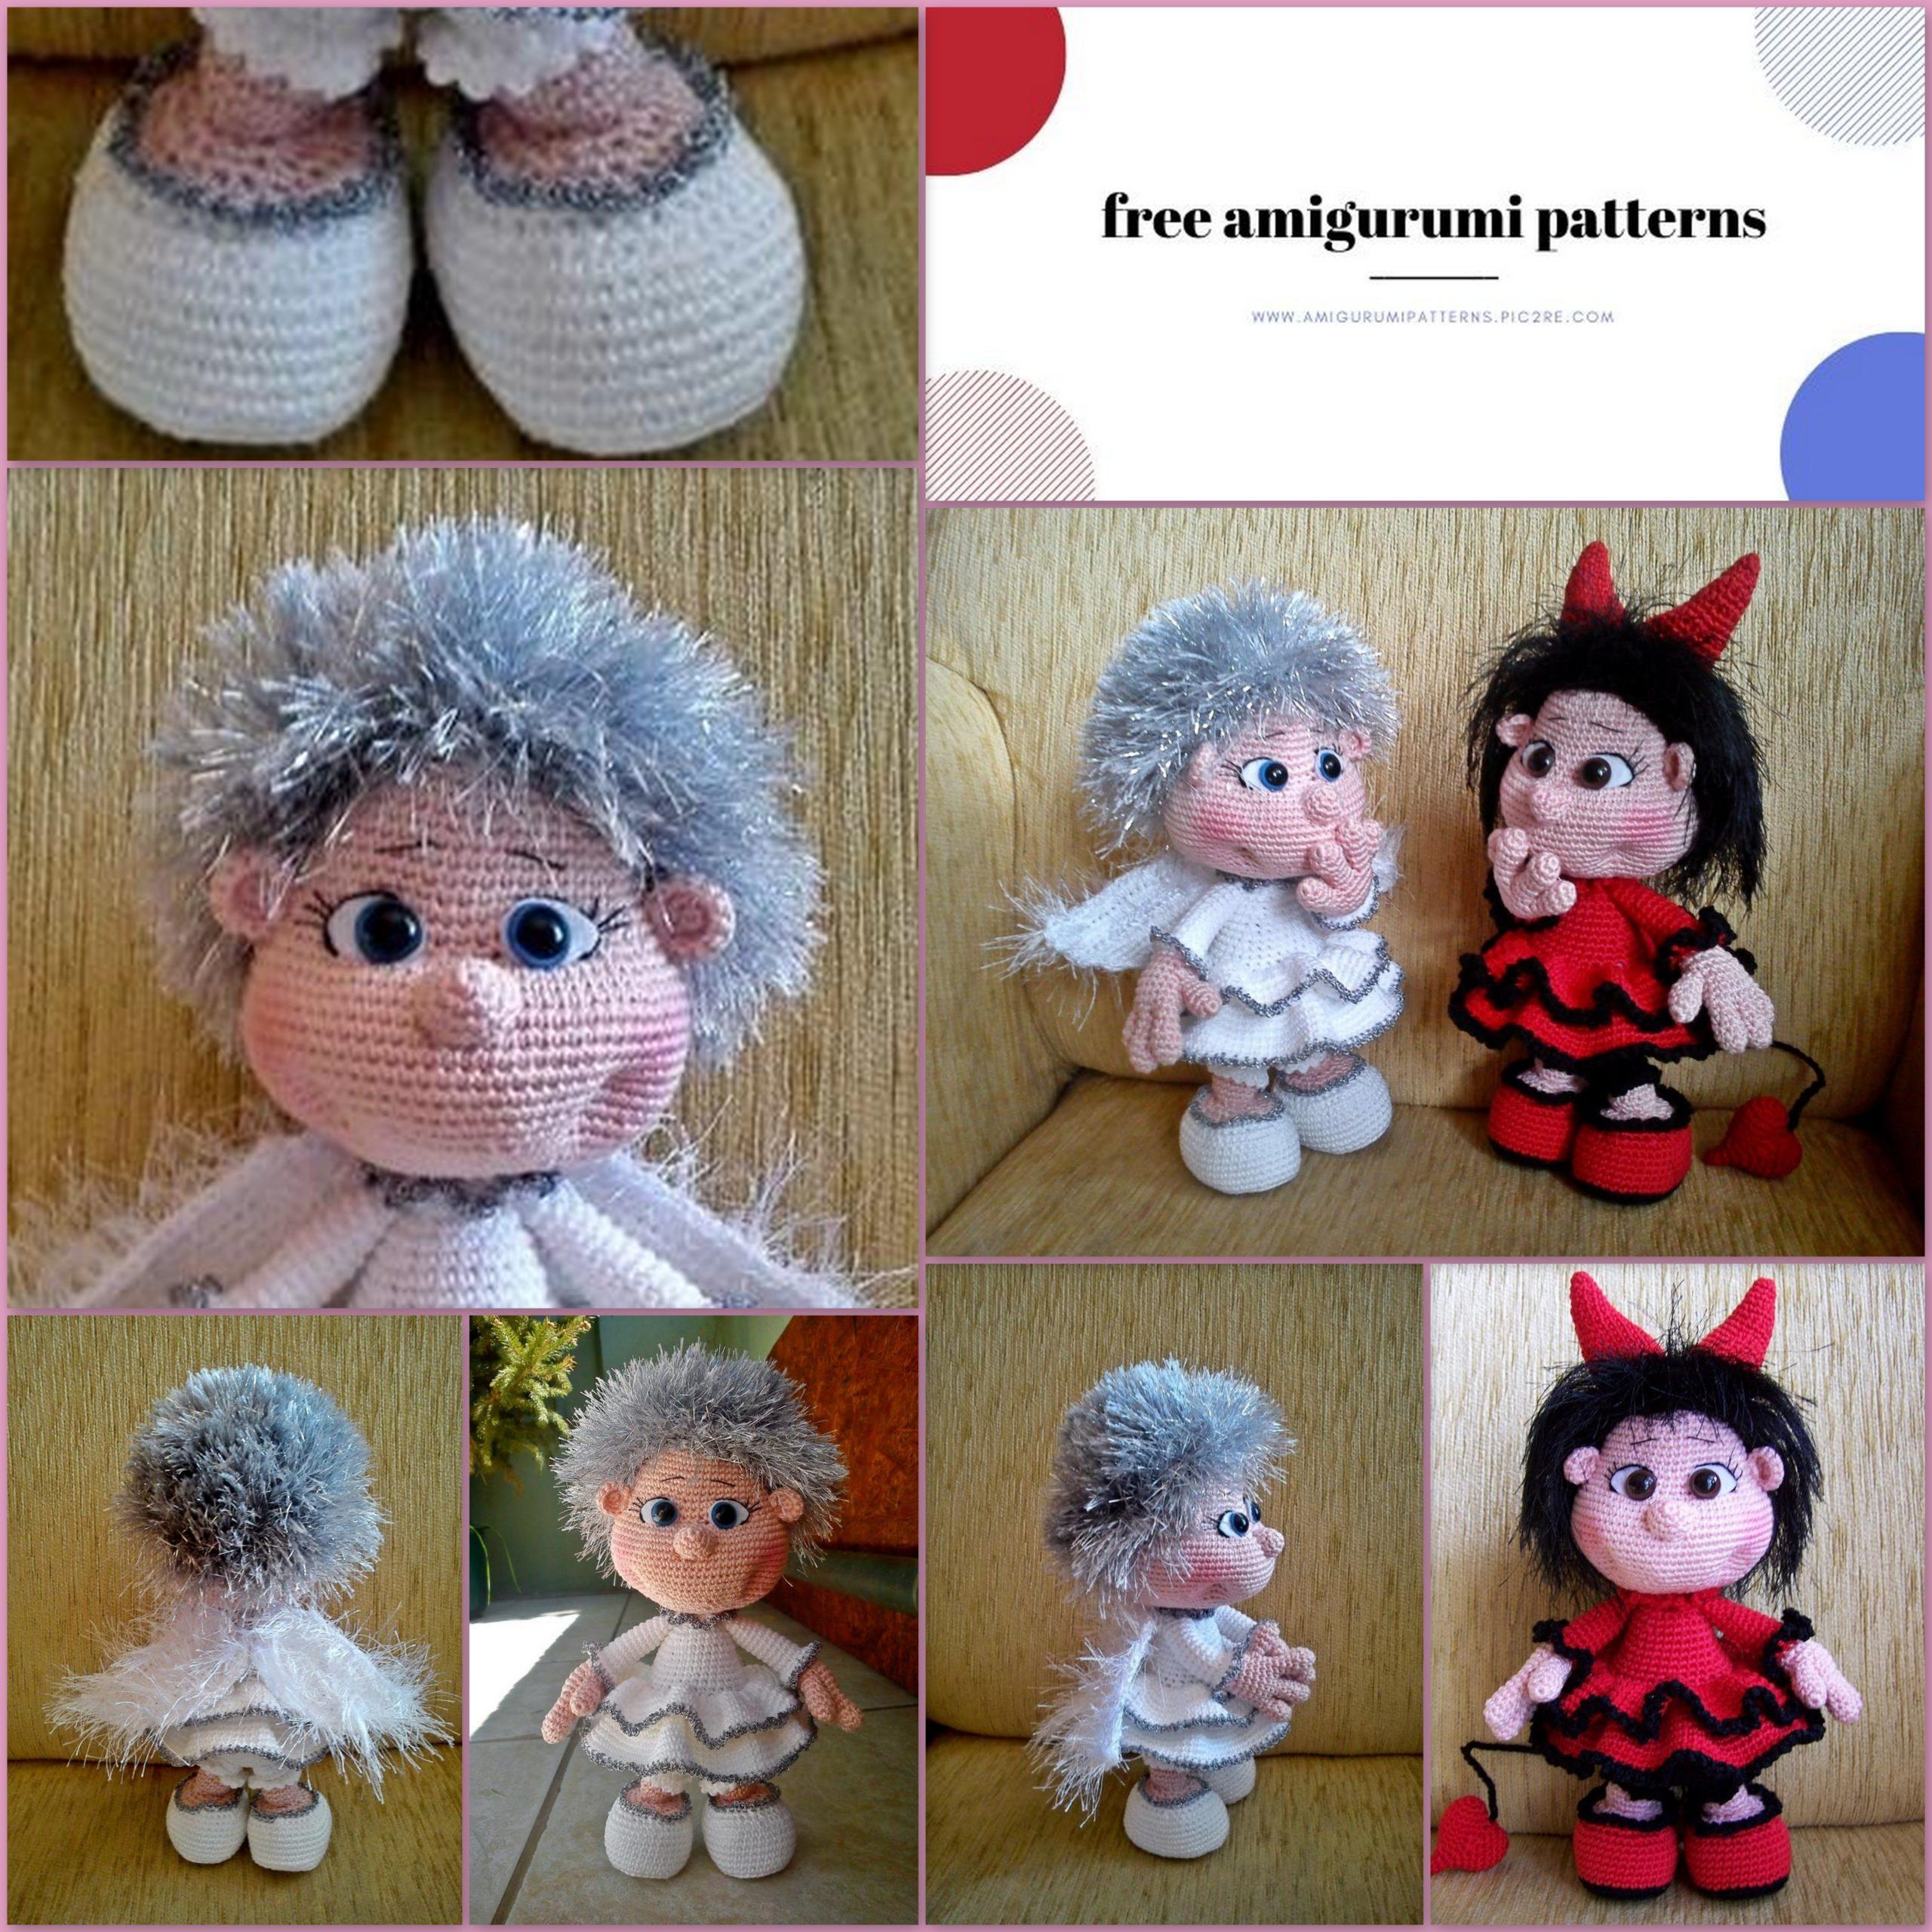 Beautiful Skills - Crochet Knitting Quilting : Amigurumi Doll Pacifier Baby  - Free Crochet Pattern | 2560x2560